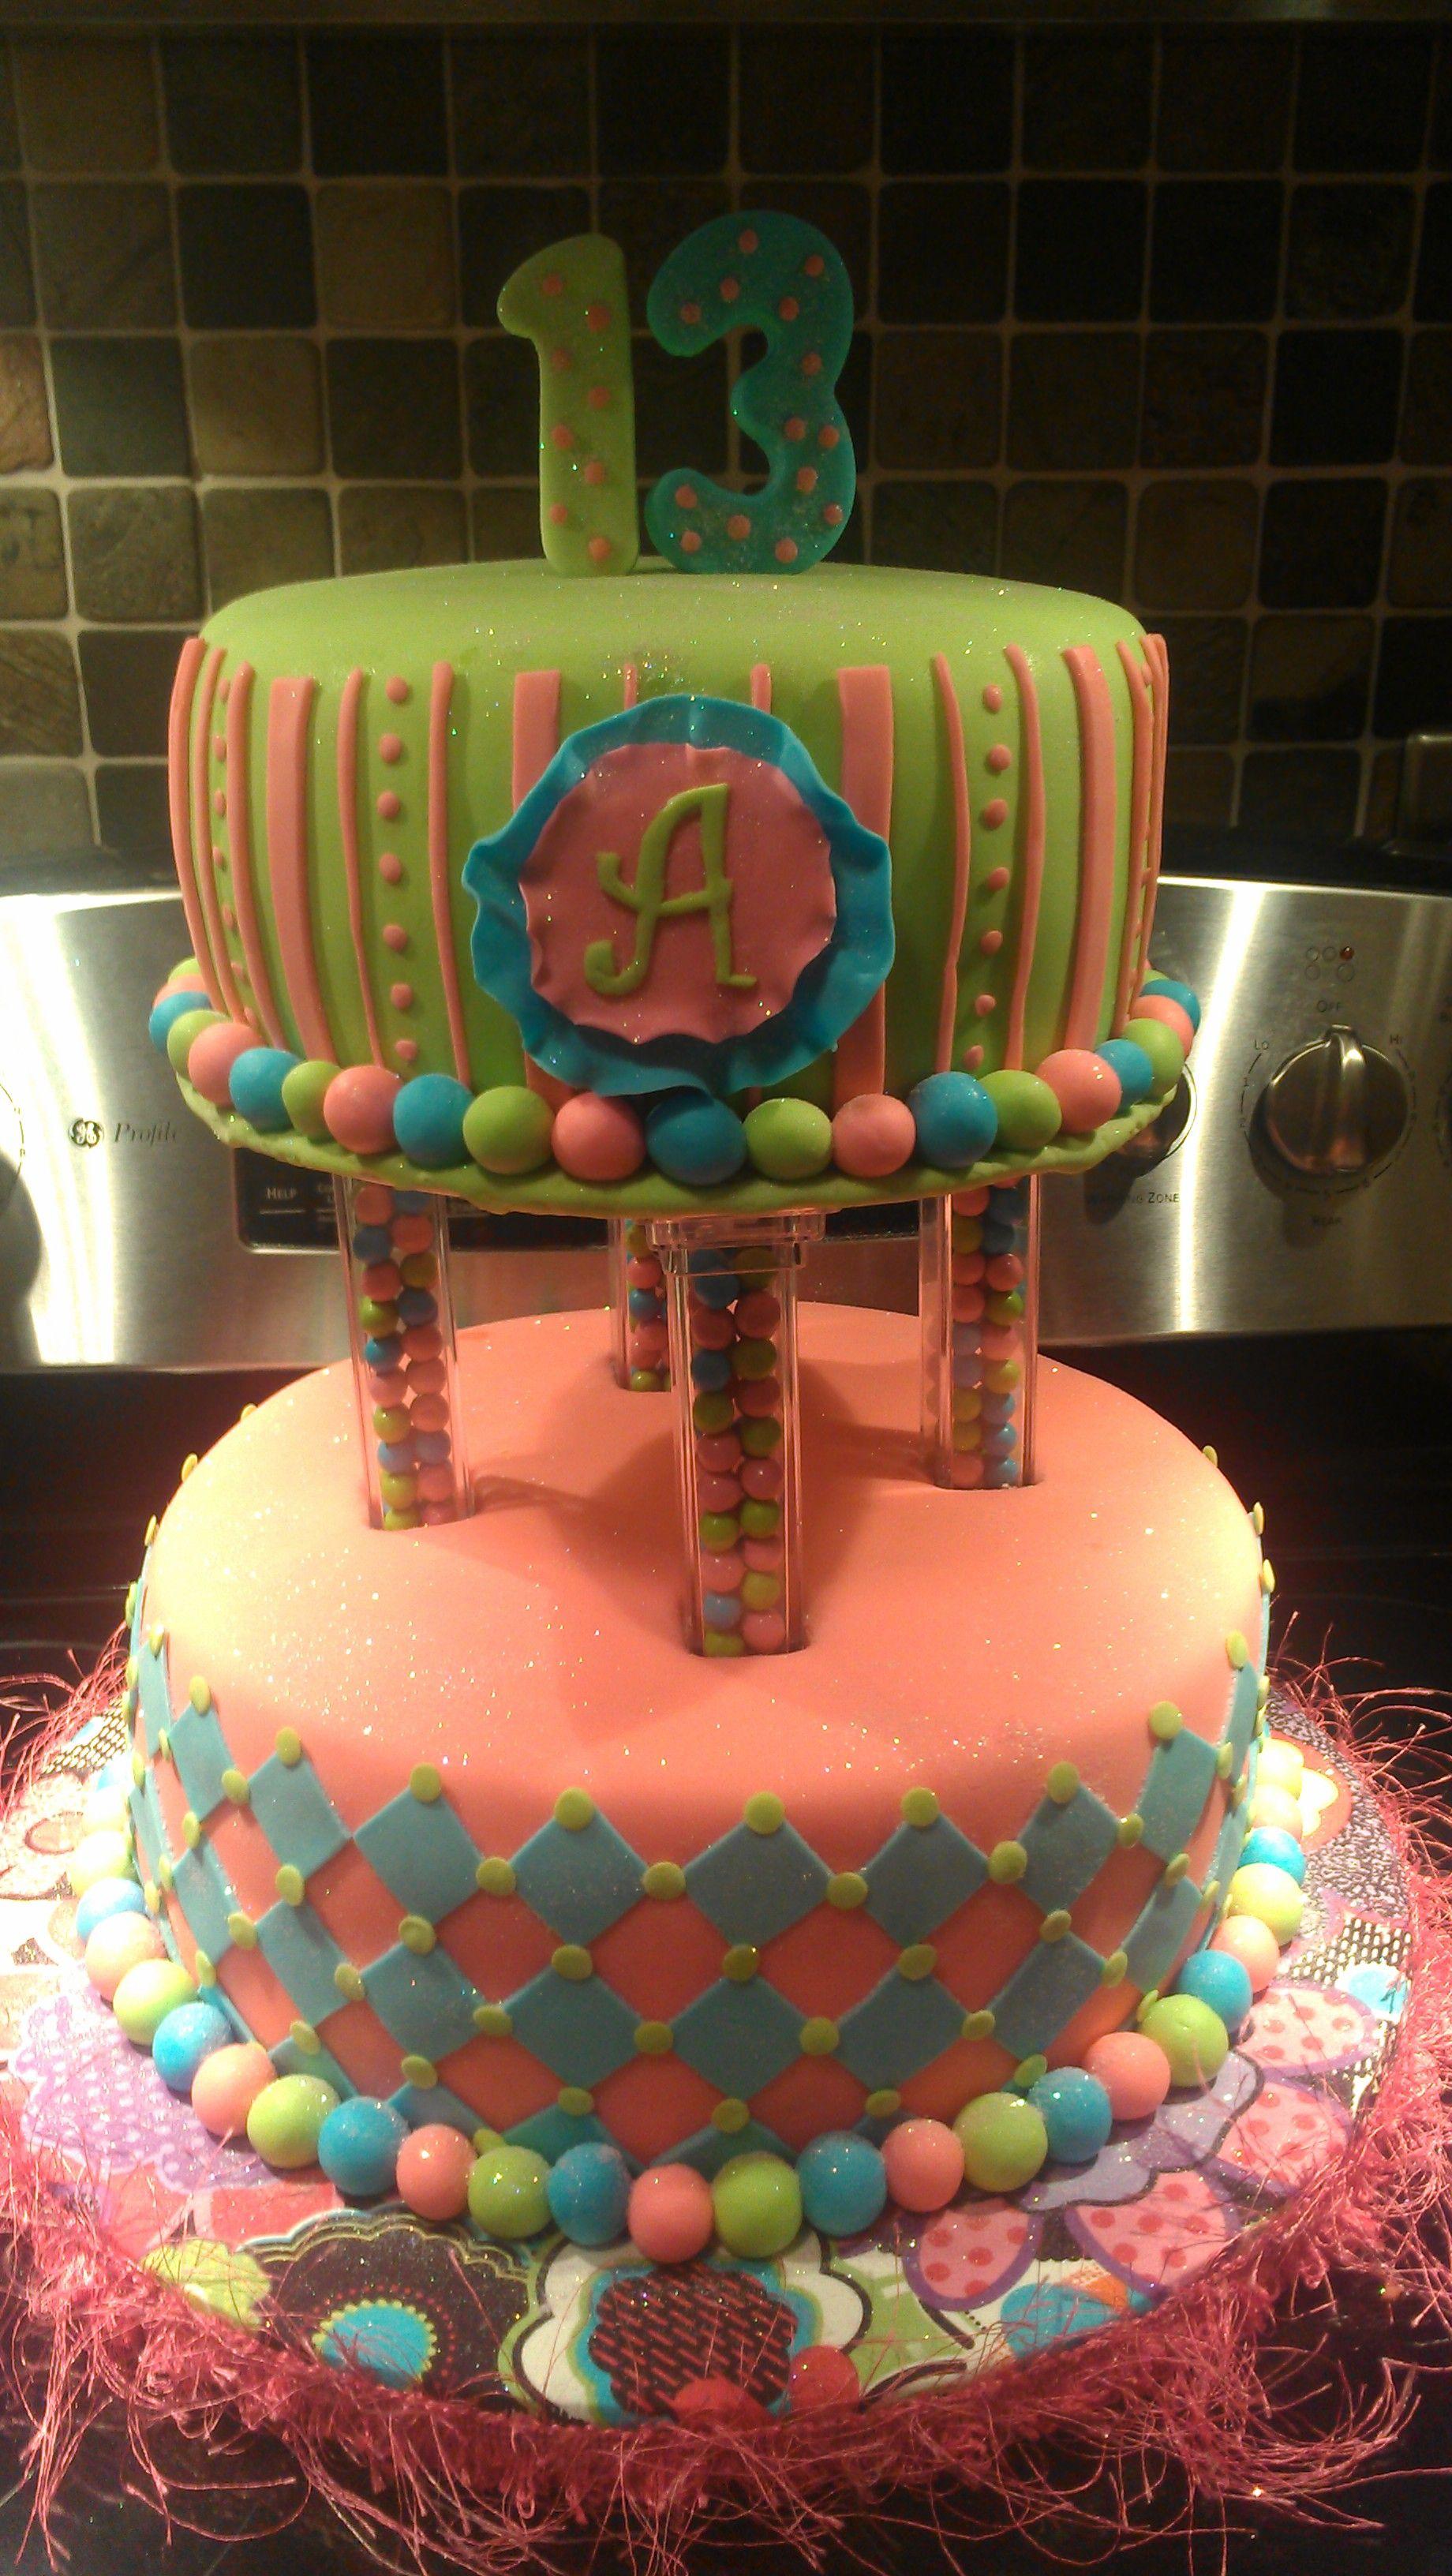 Happy 13th birthday cake ideas 35382 13th birthday for 13th birthday party decoration ideas